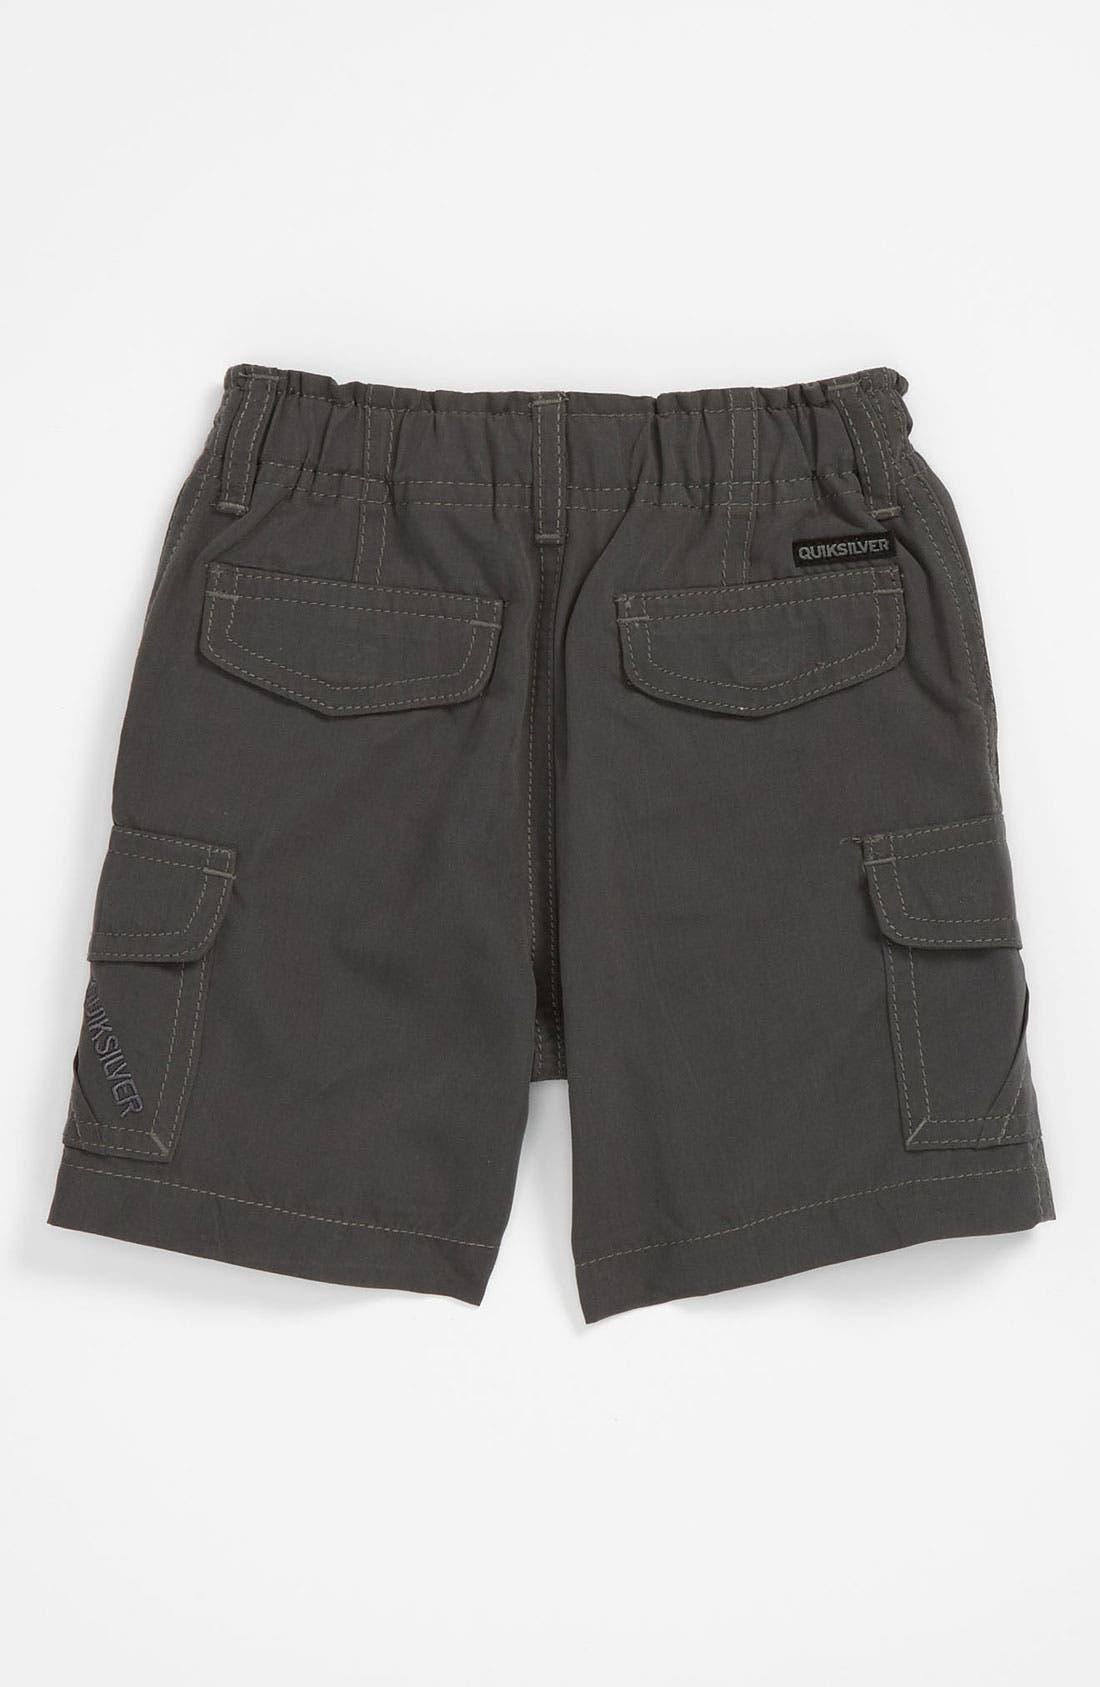 Alternate Image 2  - Quiksilver 'Phofilled' Shorts (Toddler)